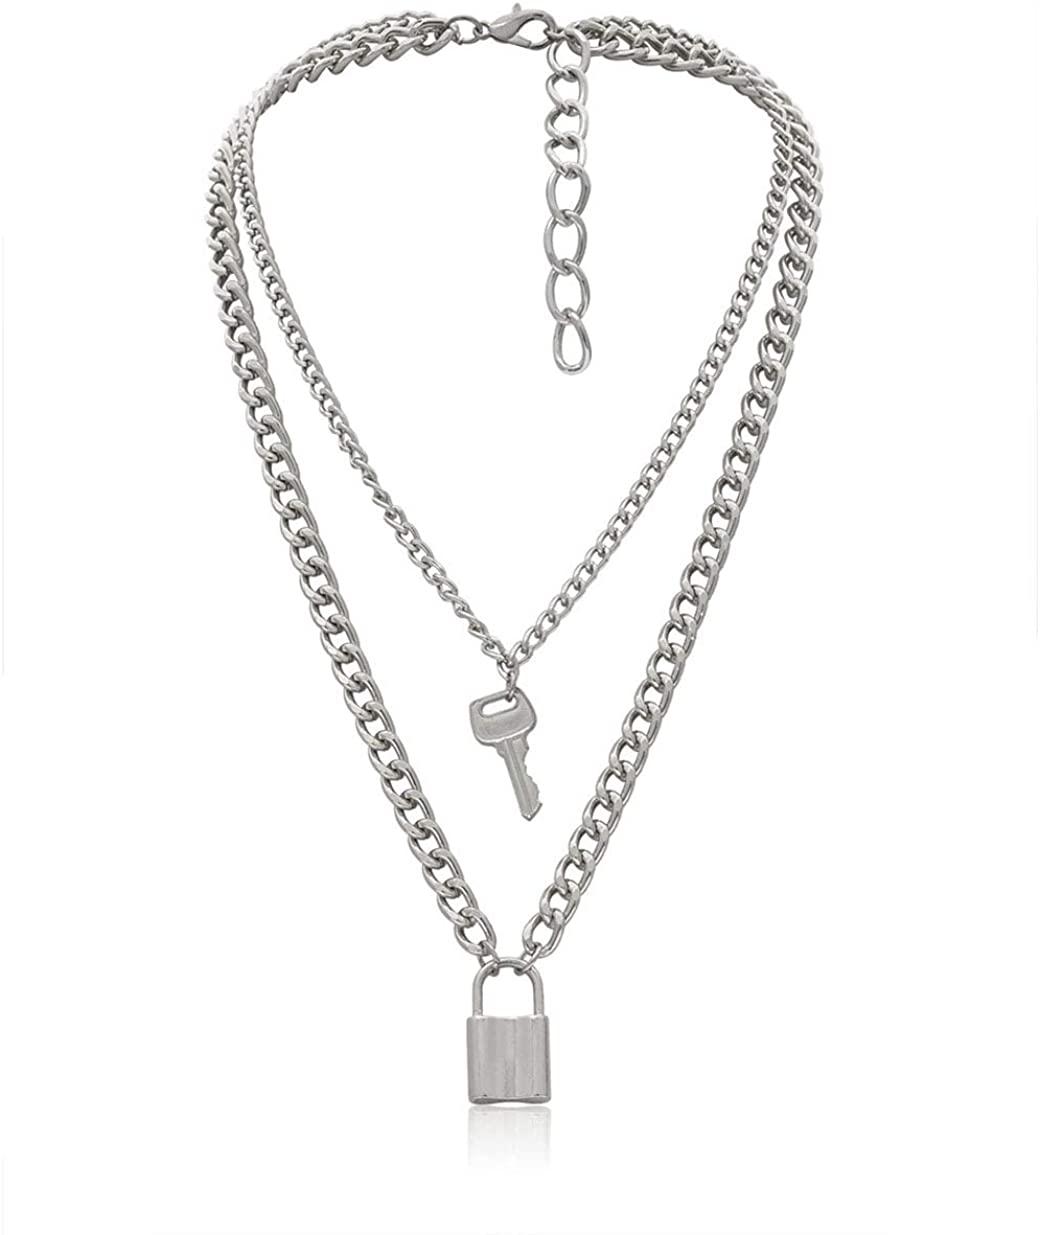 Lock Key Pendant Necklace Statement Long Chain Punk Multilayer Choker Necklace for Women Men